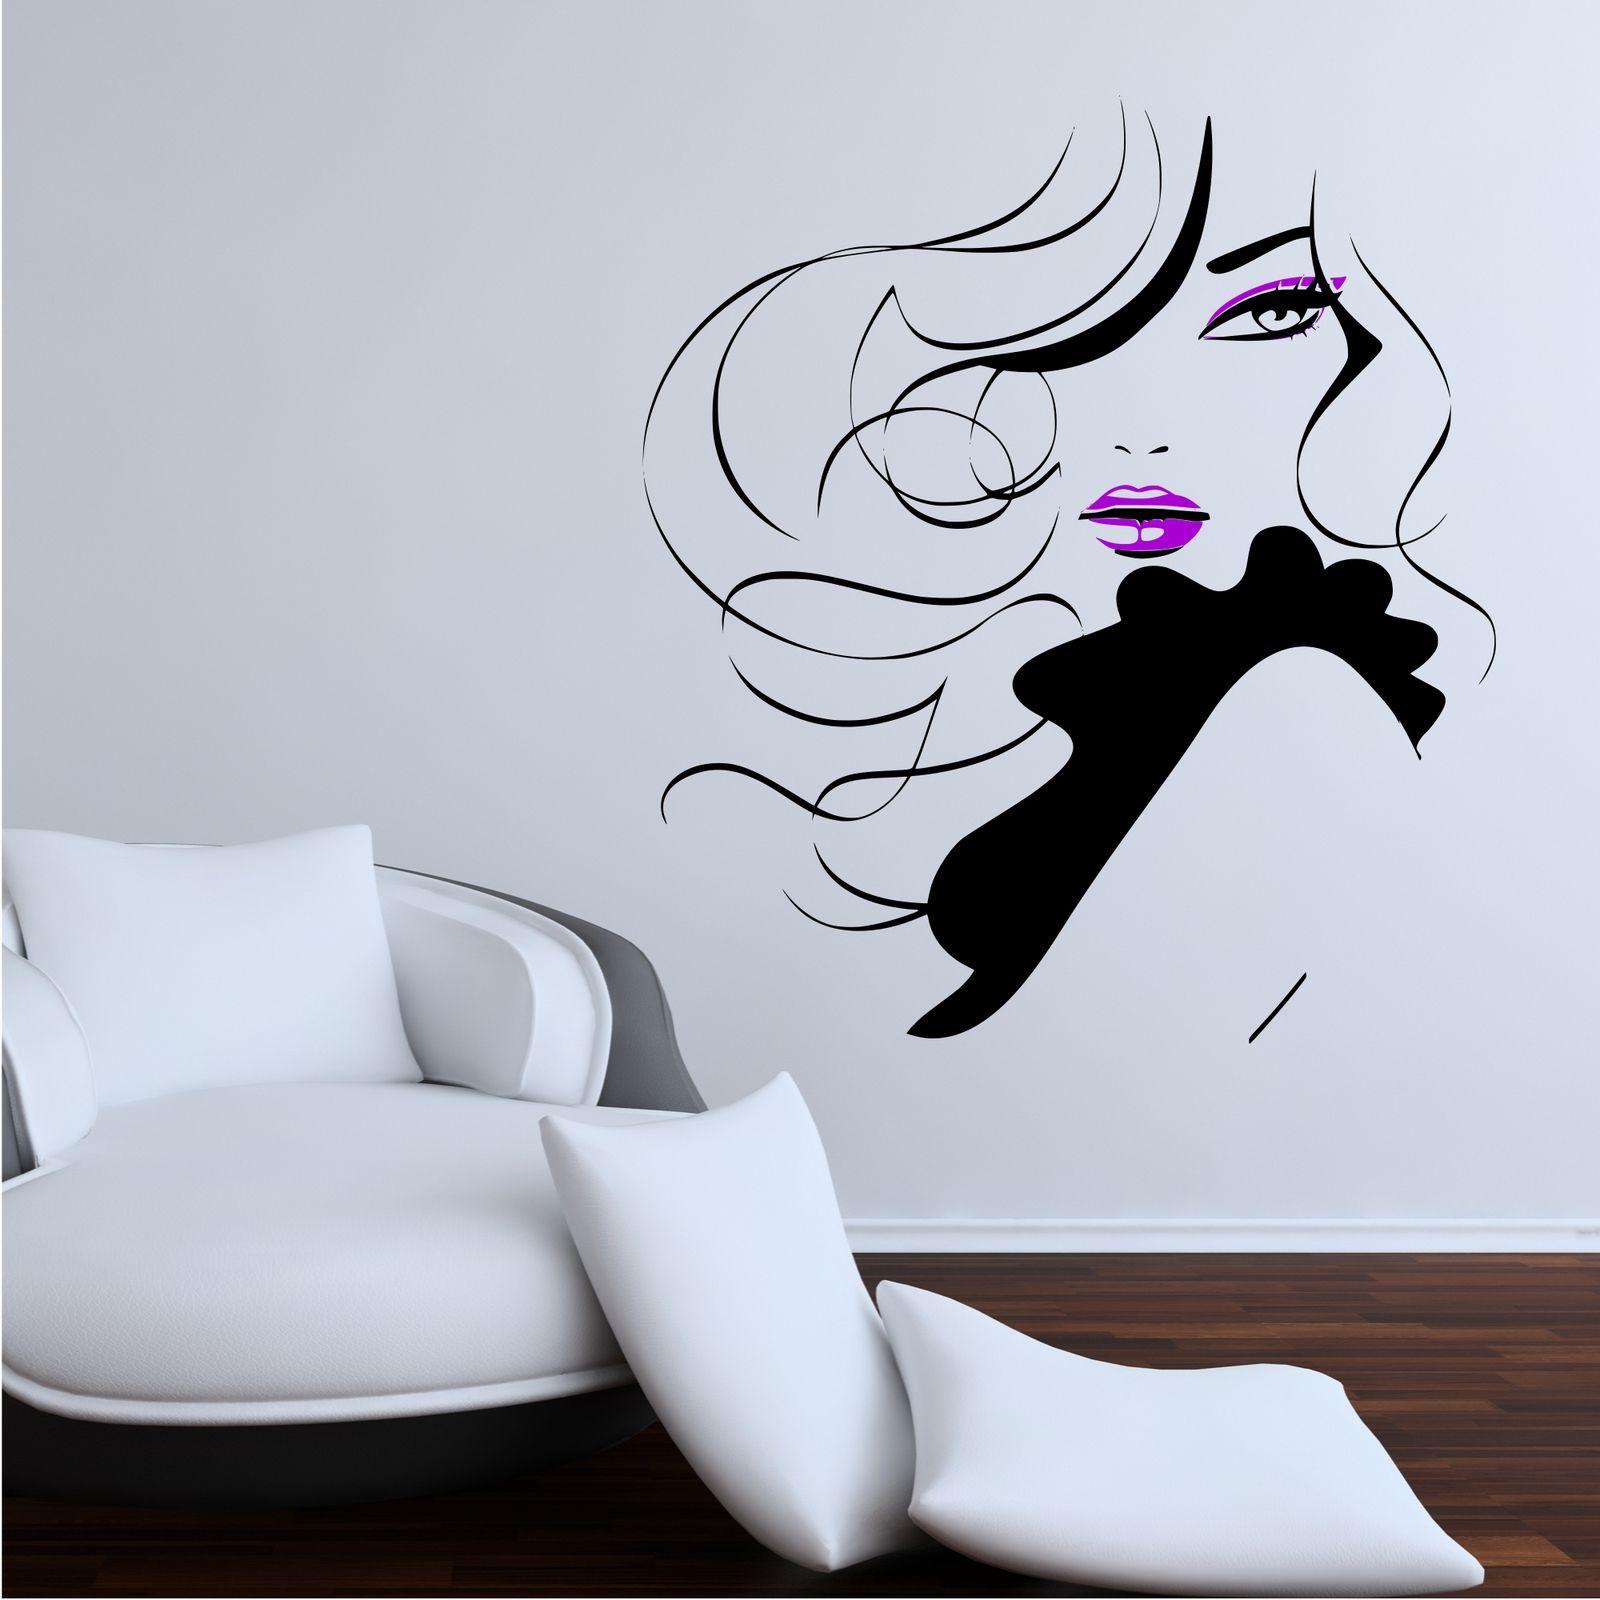 Pin-Up-Femme-Moderne-Salon-de-Coiffure-Autocollant-Mural-Decoration-Decalcomanie miniature 6